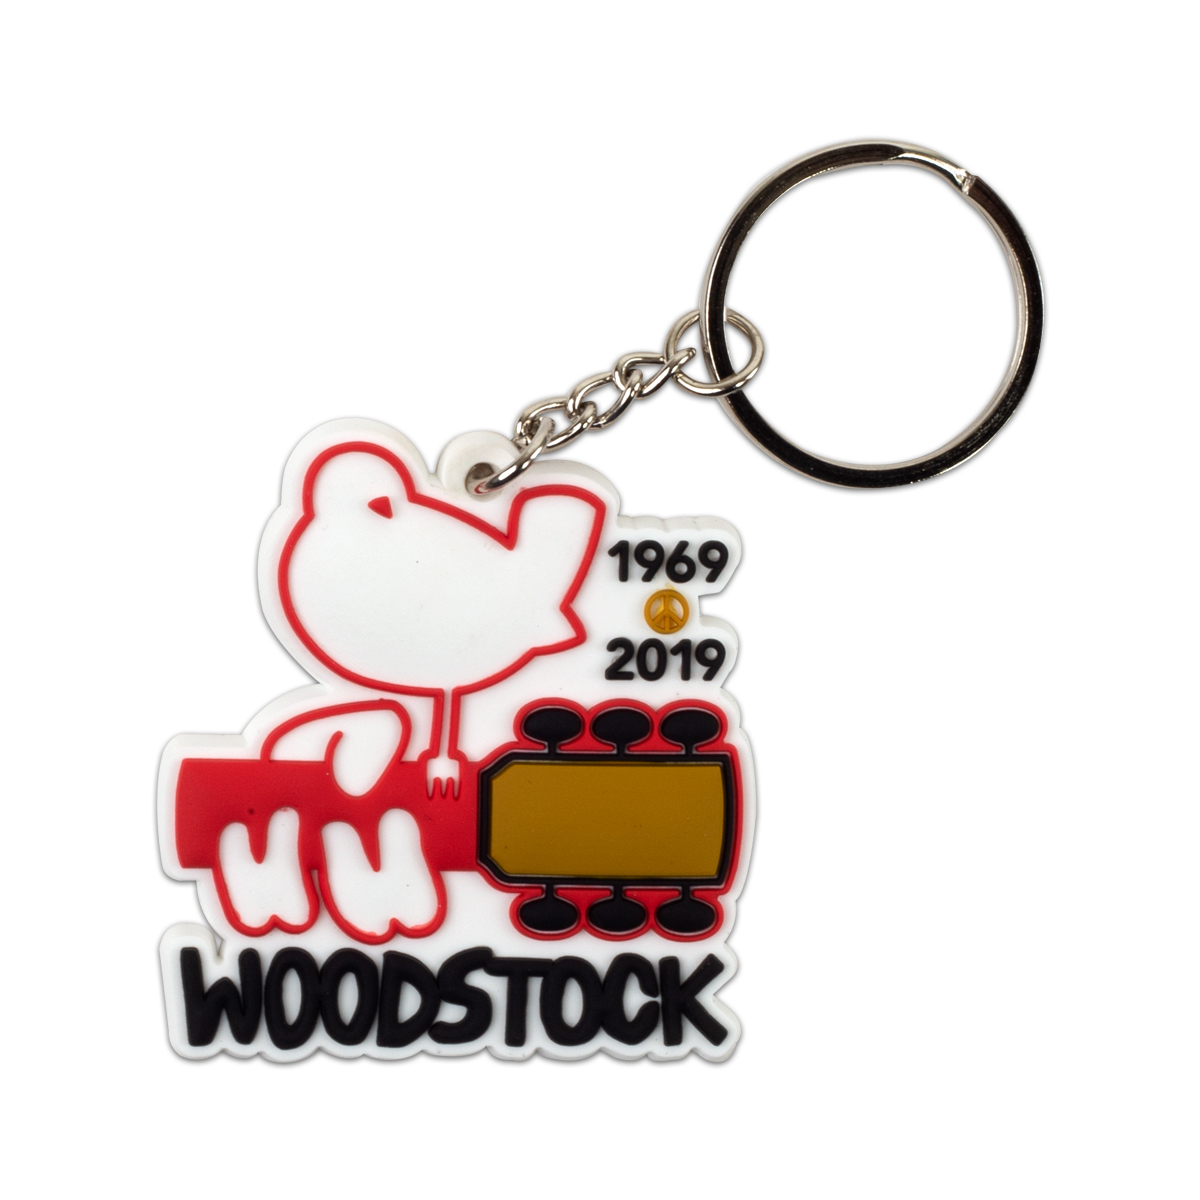 Woodstock Keychain